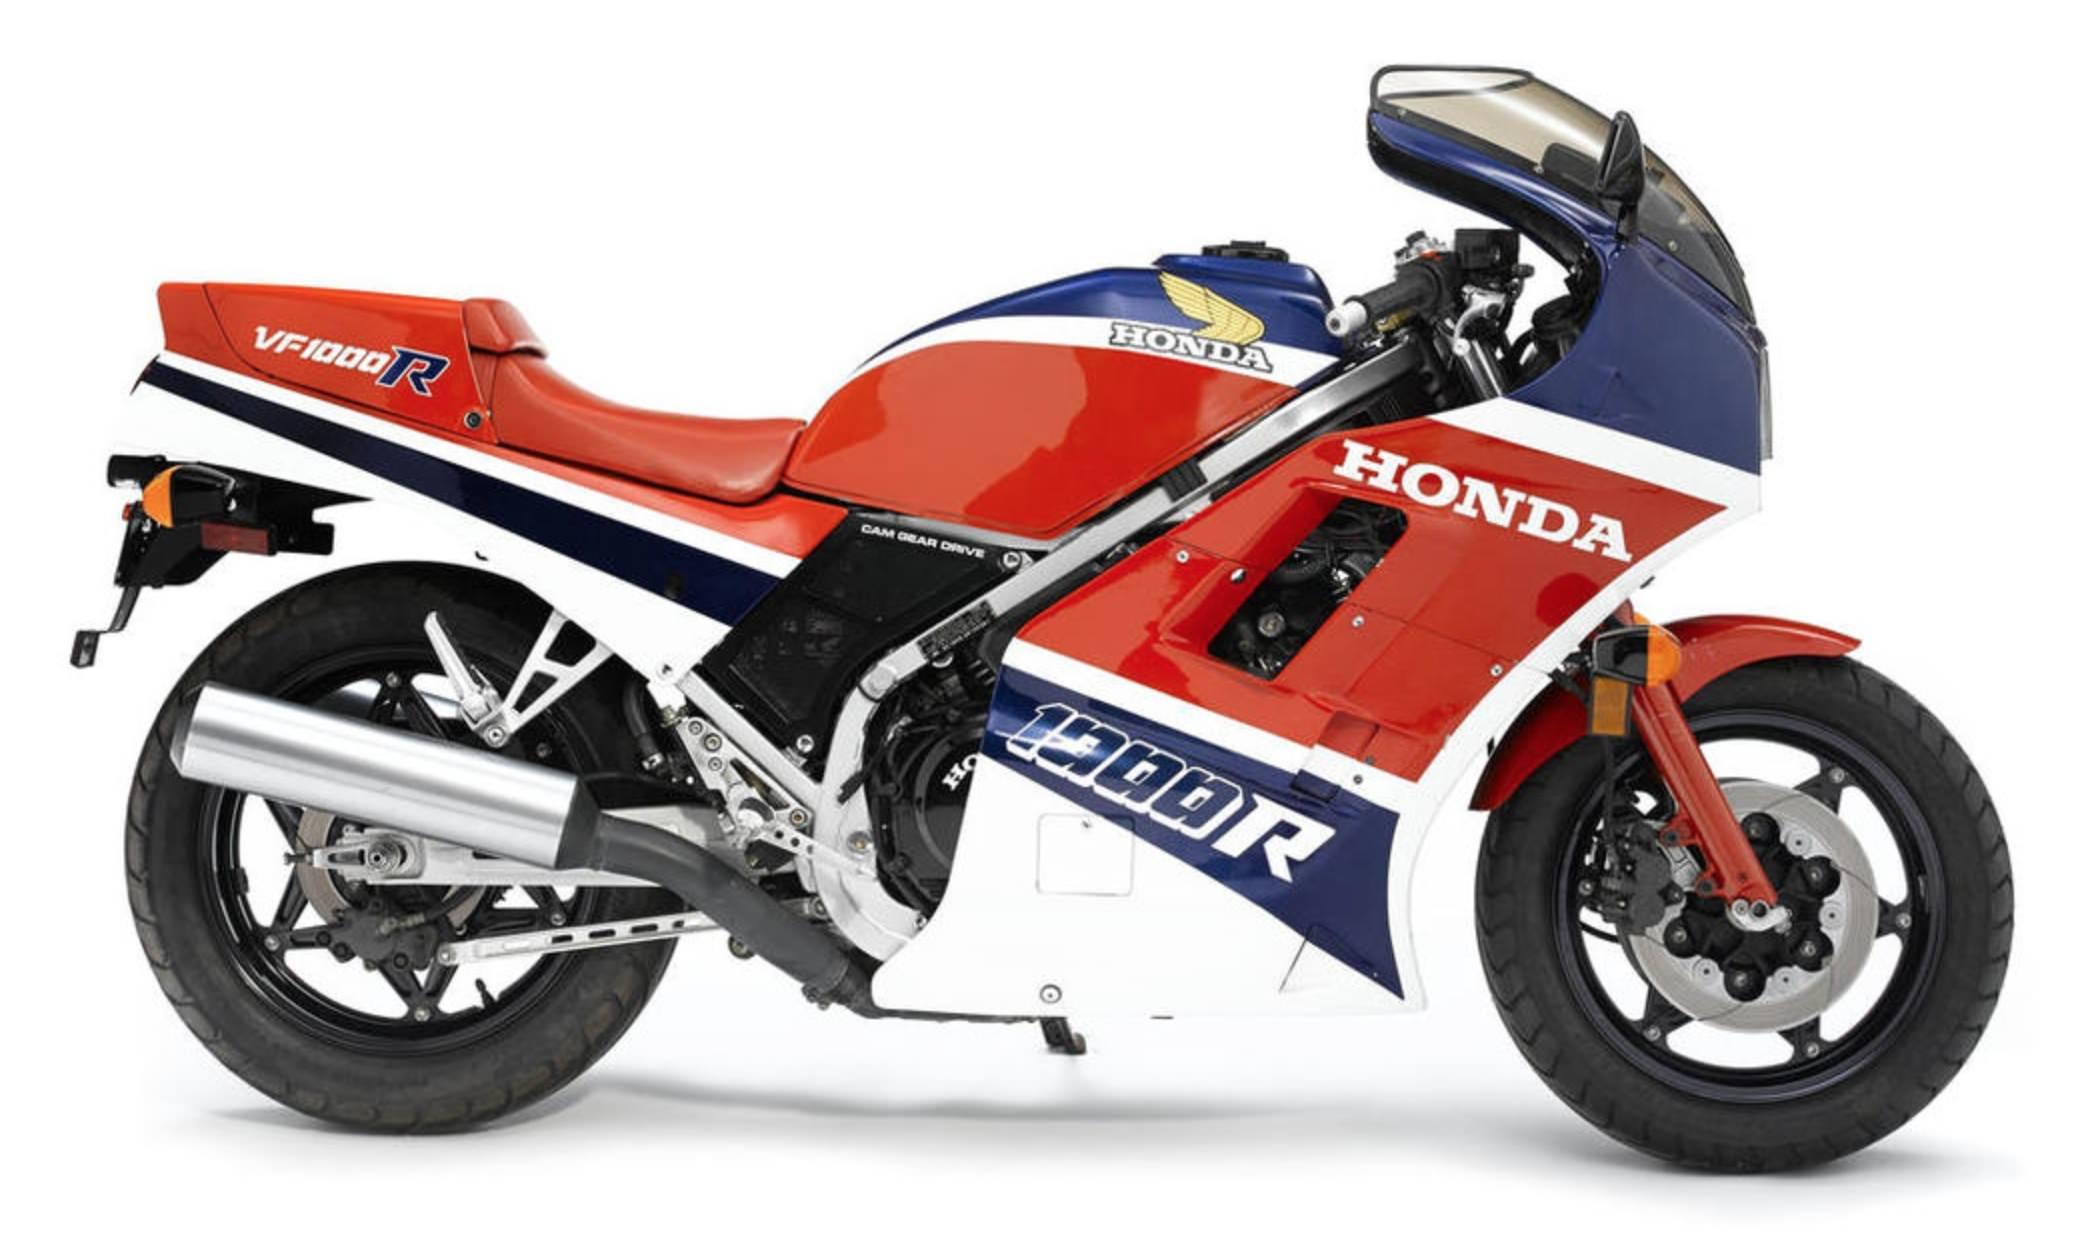 HONDA VF1000R PARTS